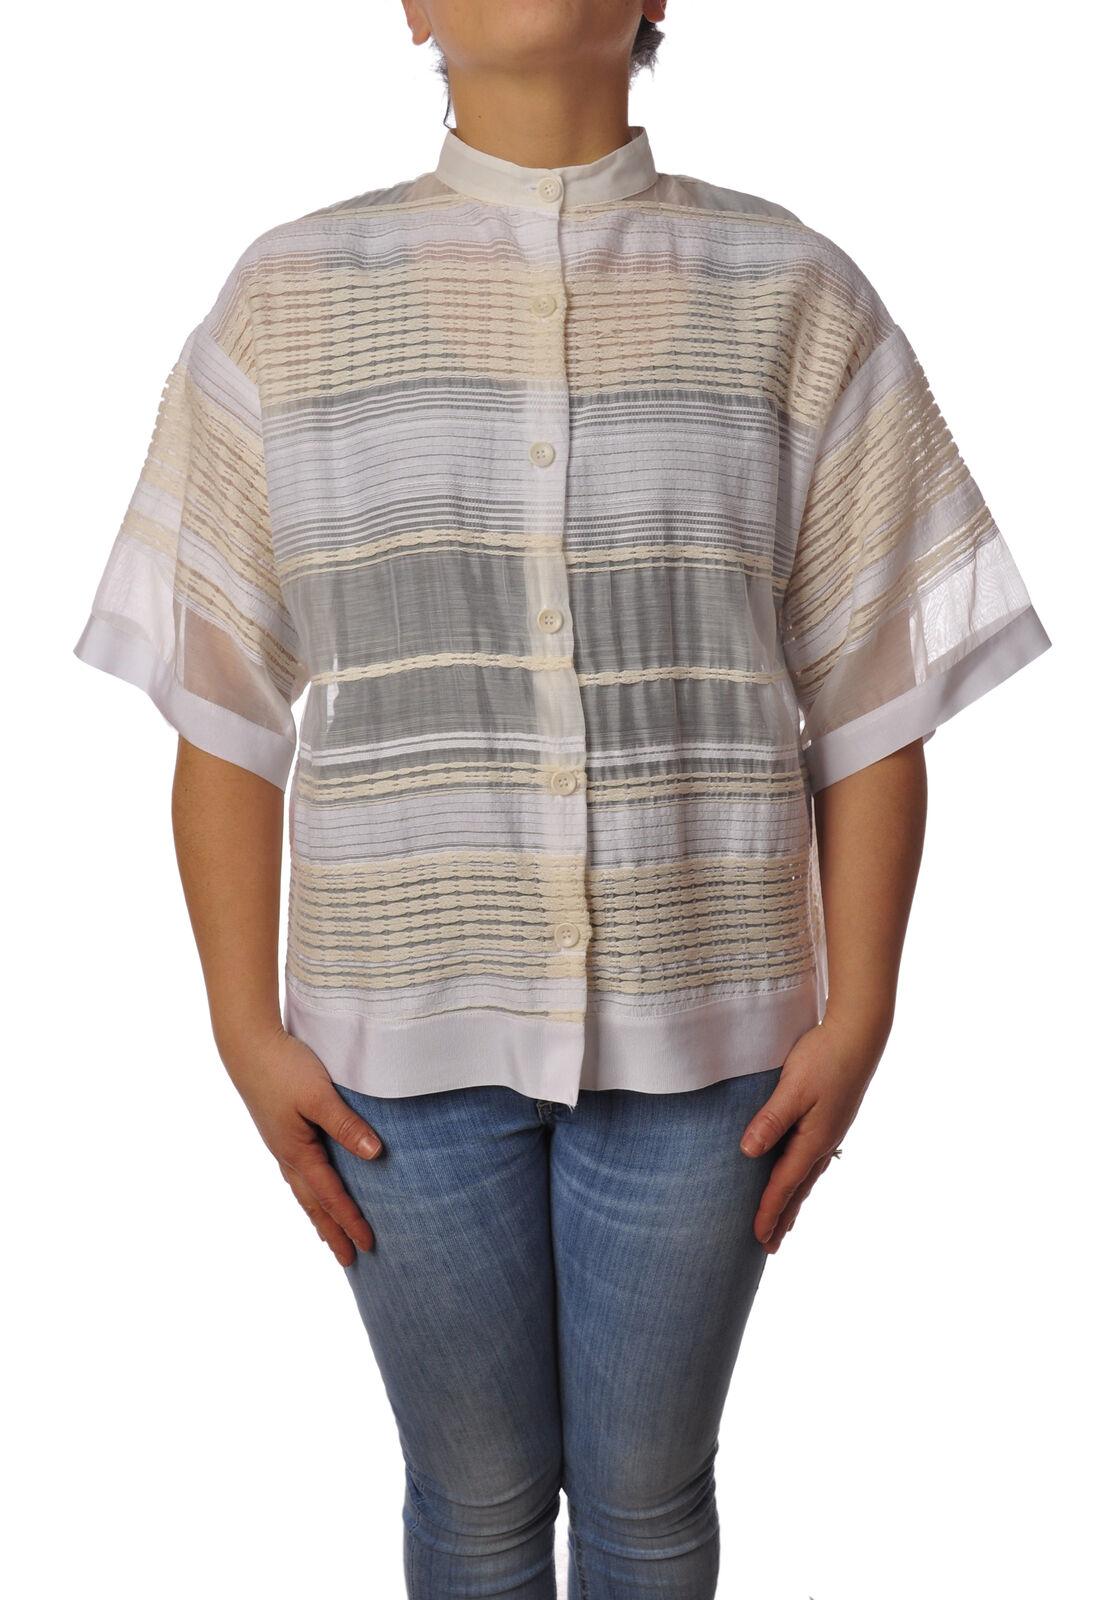 Garage Nouveau - Shirts-Shirt - Woman - Weiß - 4978327B181231